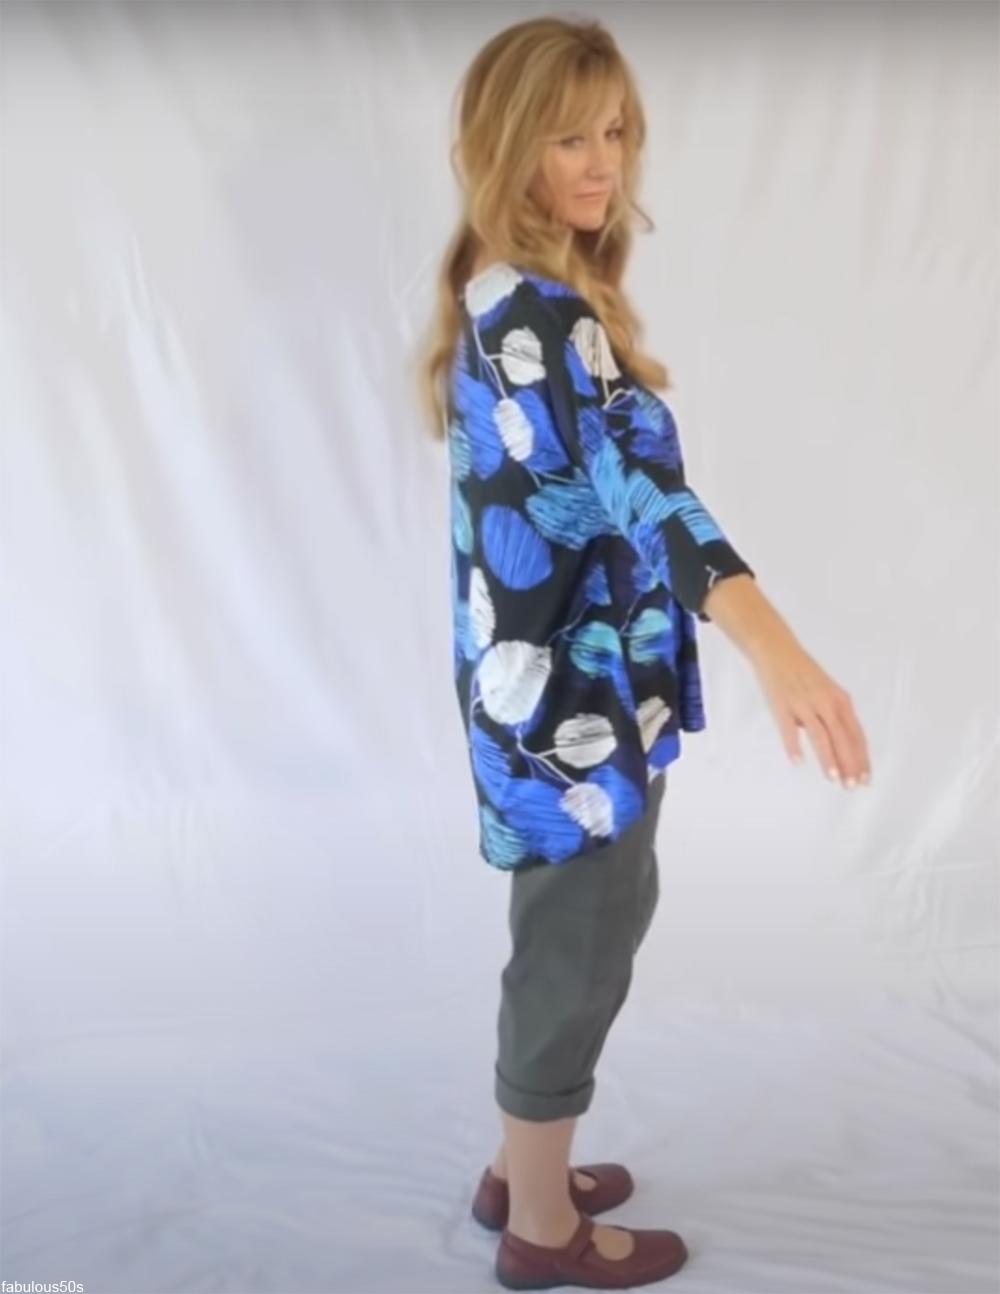 woman wearing baggy top and baggy capri pants